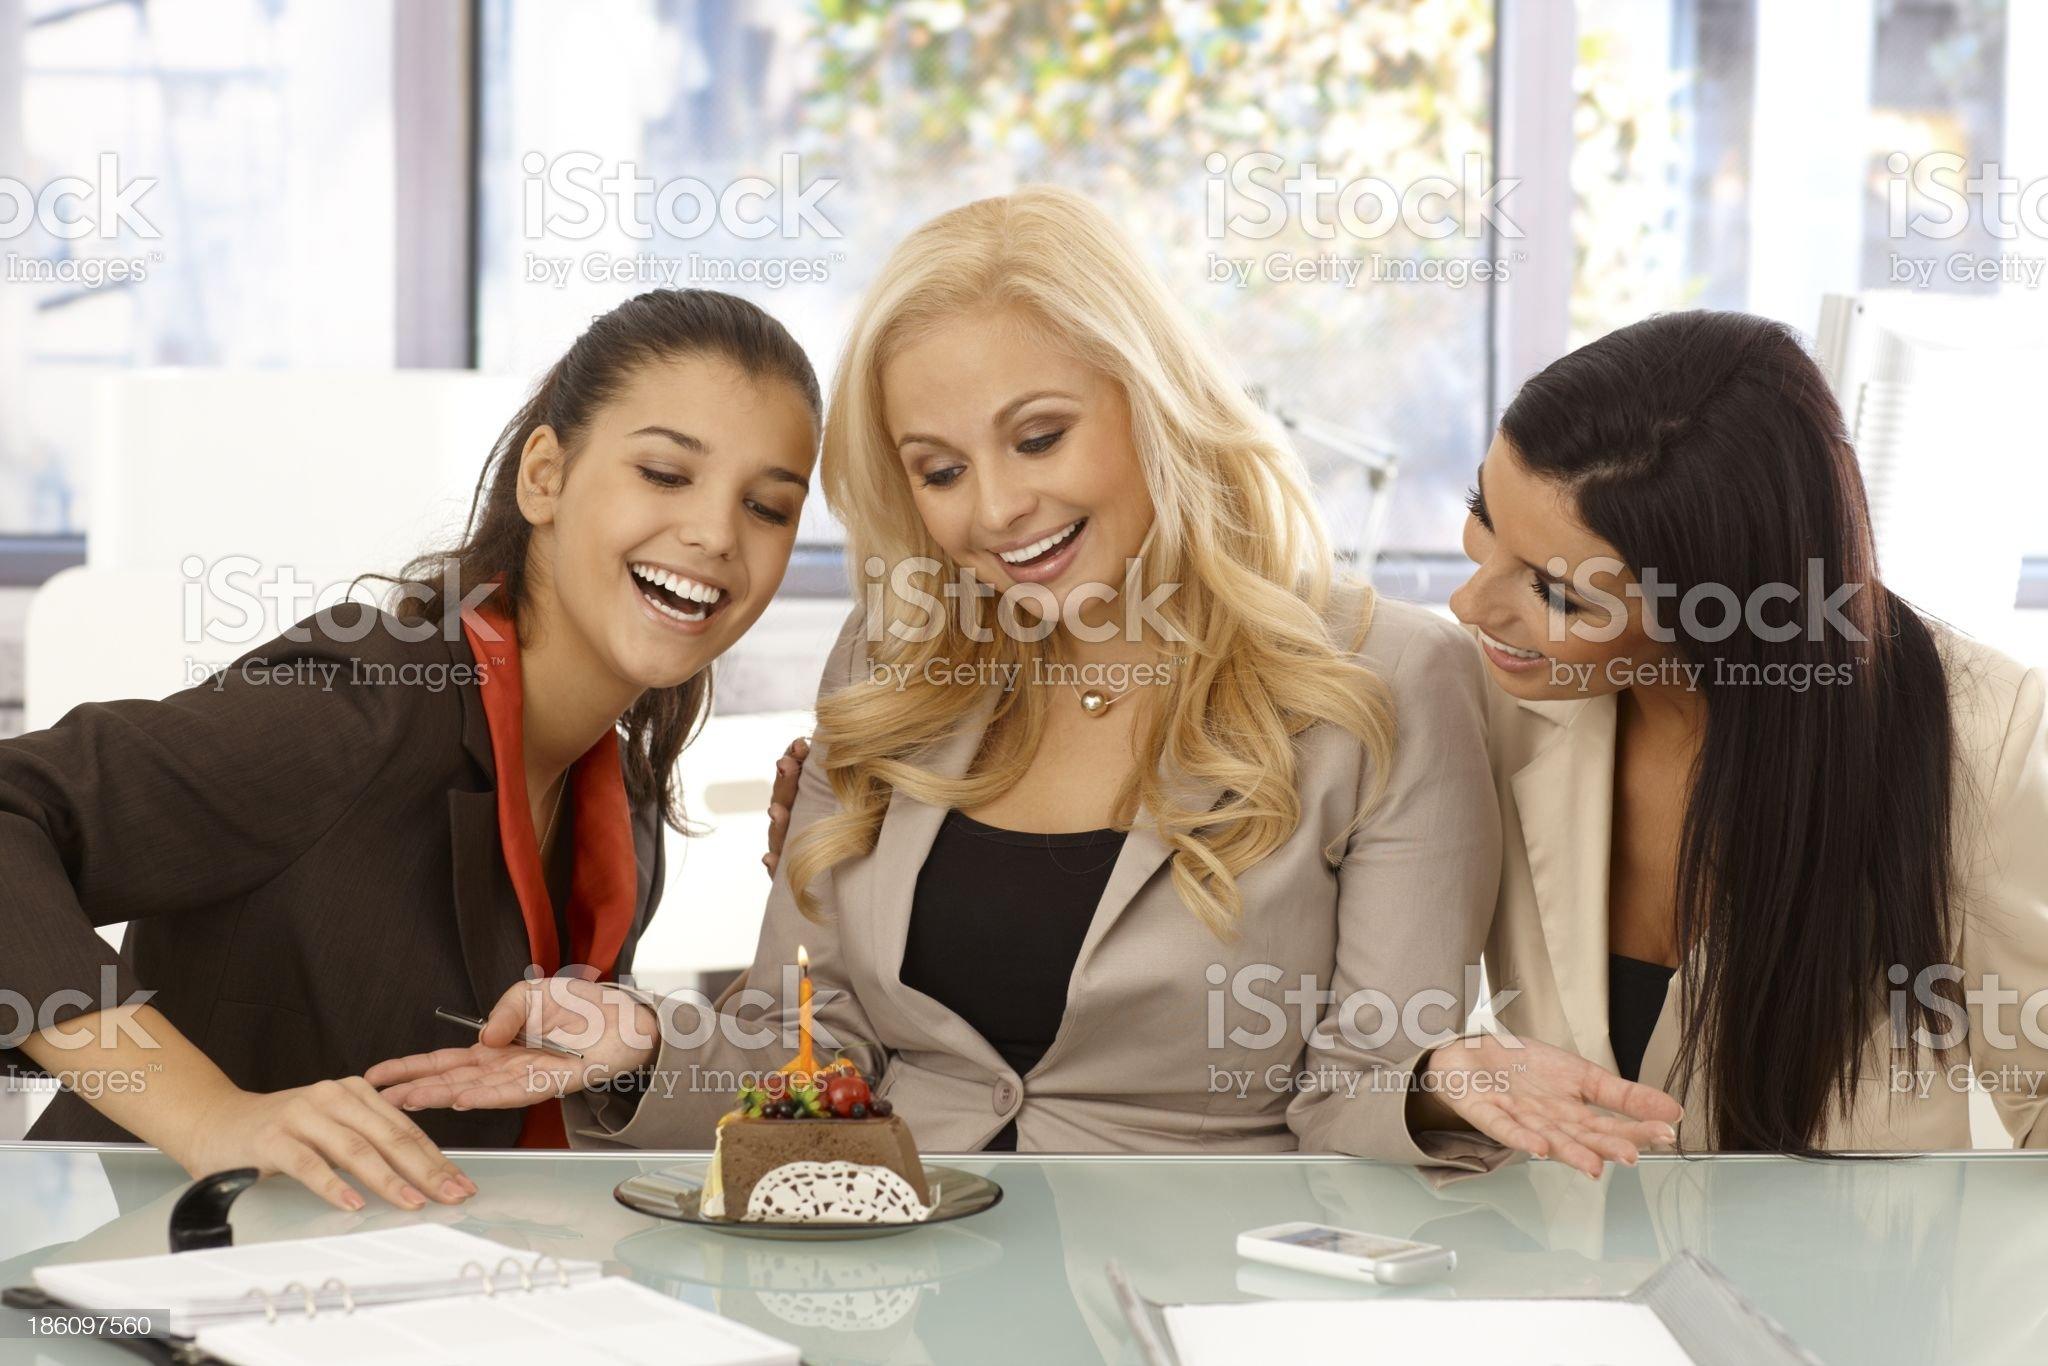 Girls celebrating birthday at workplace royalty-free stock photo